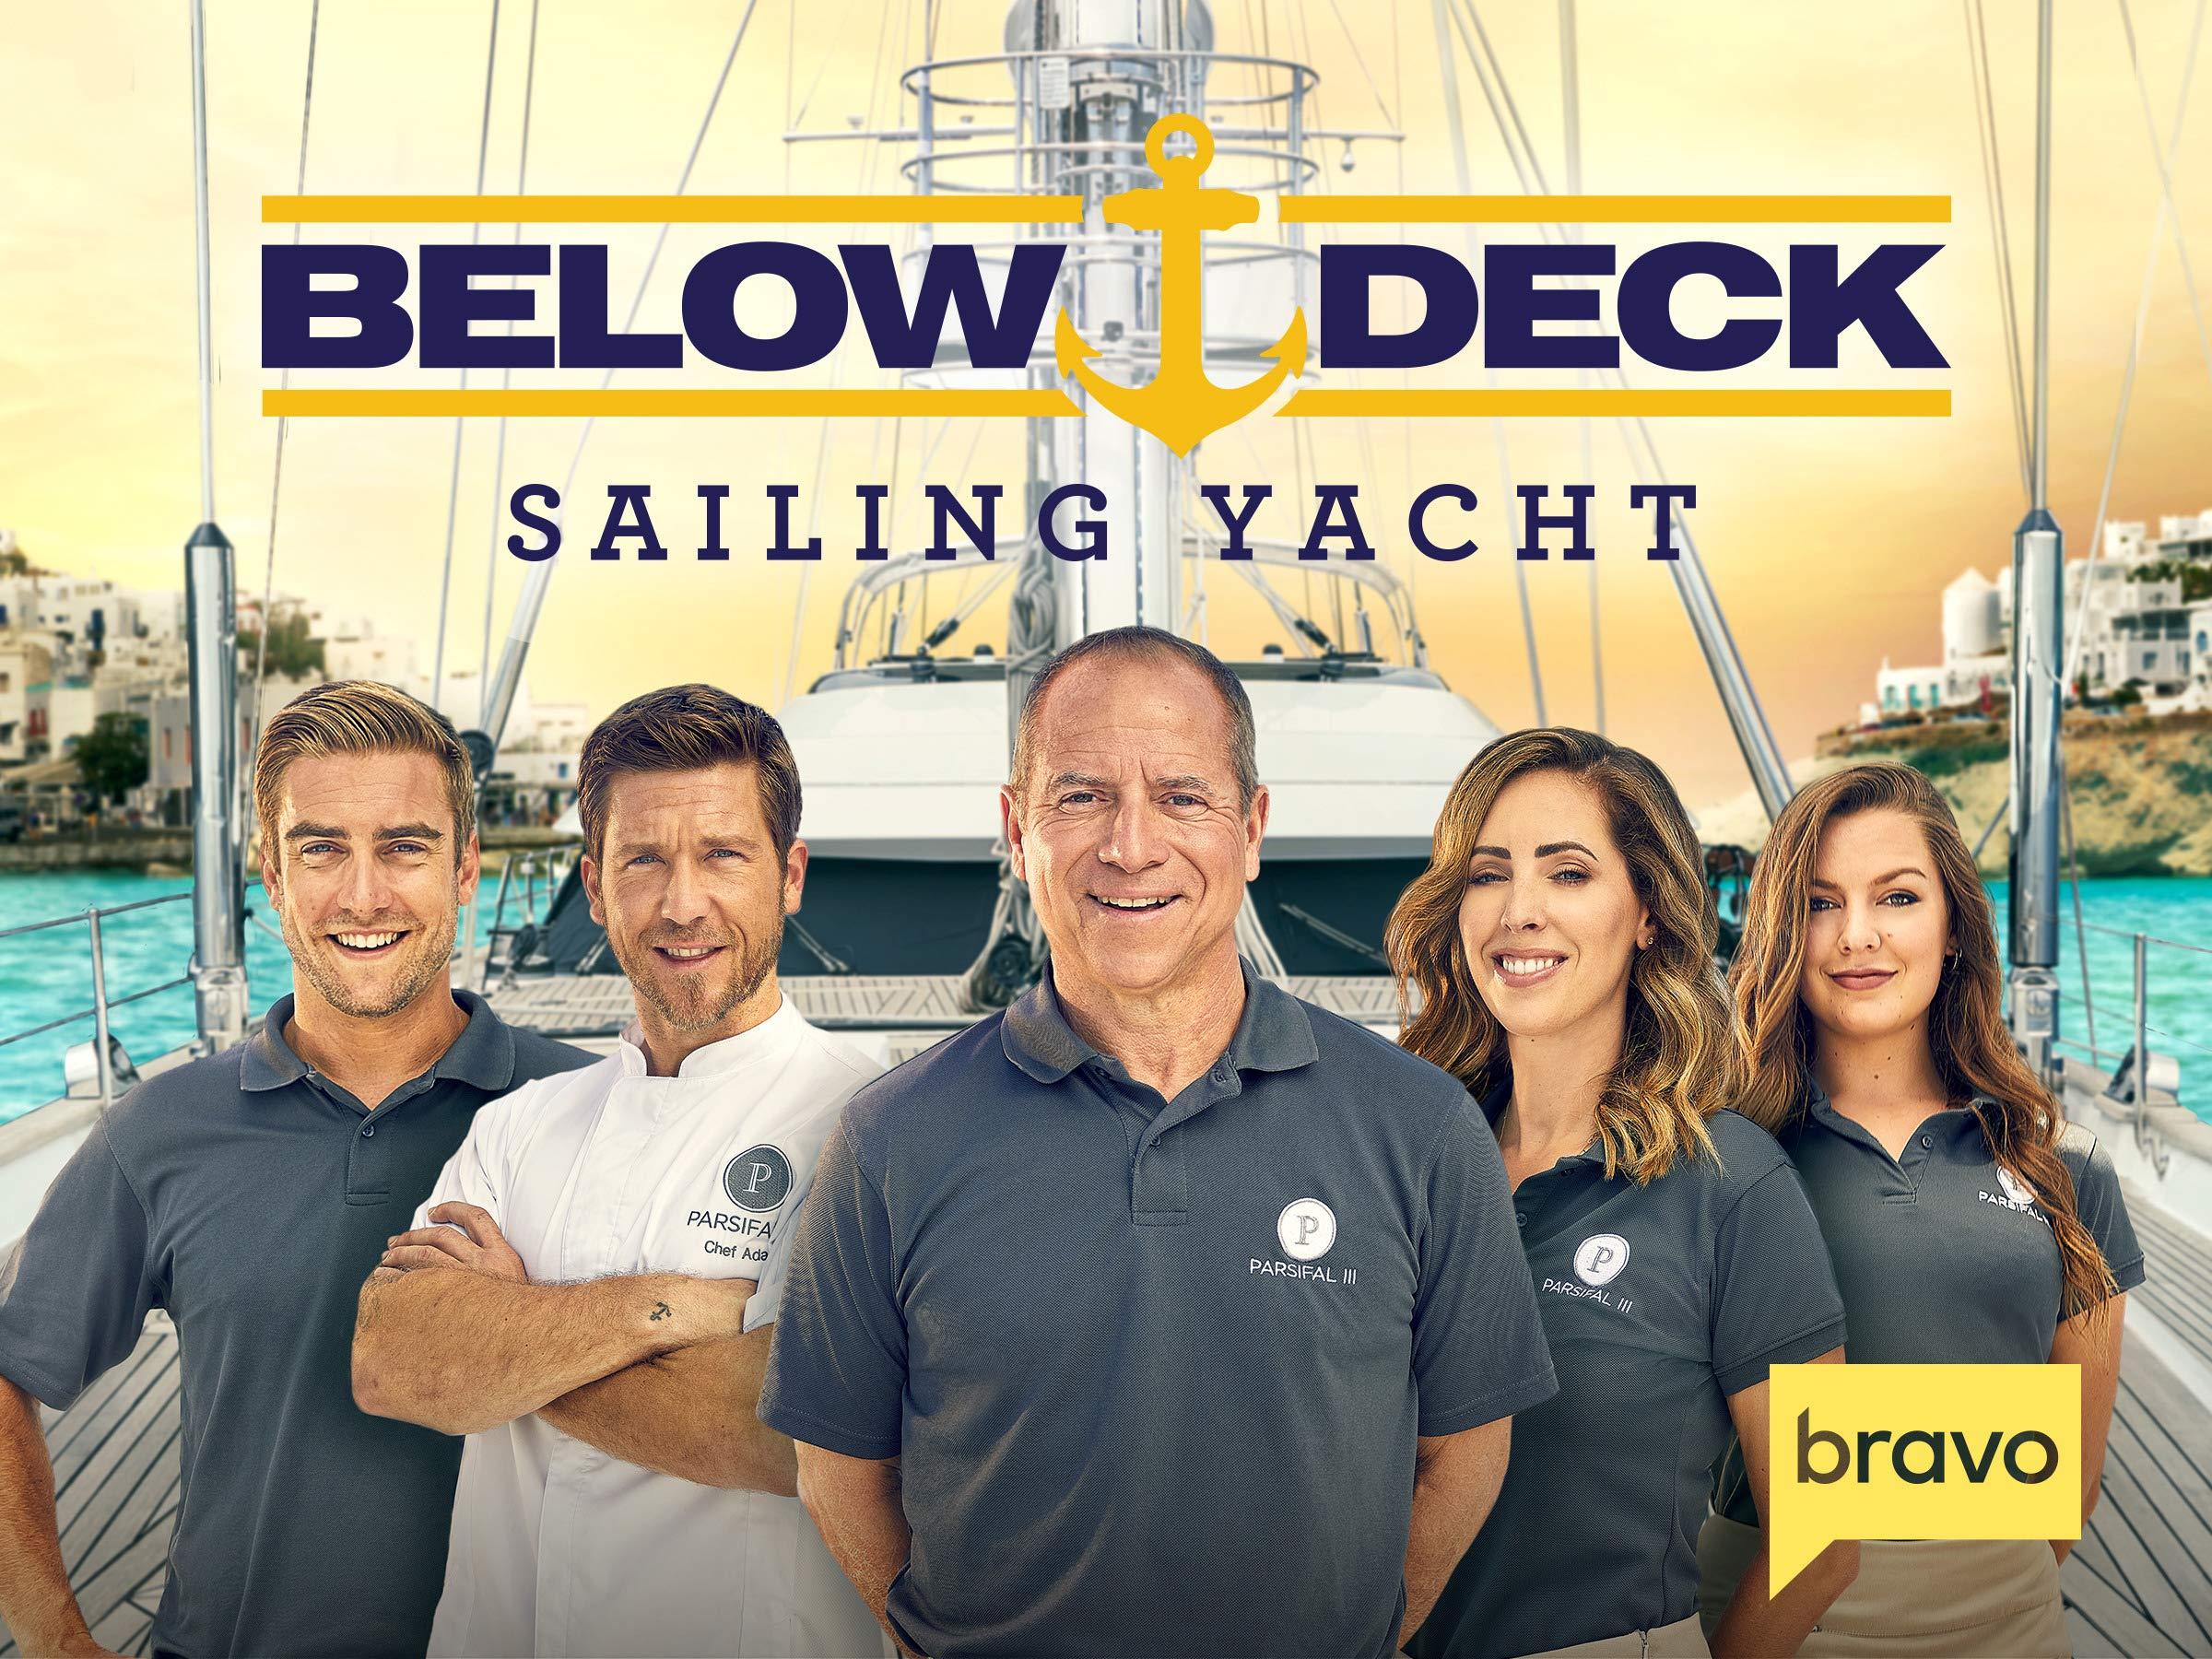 below deck mediterranean season 2 watch online free